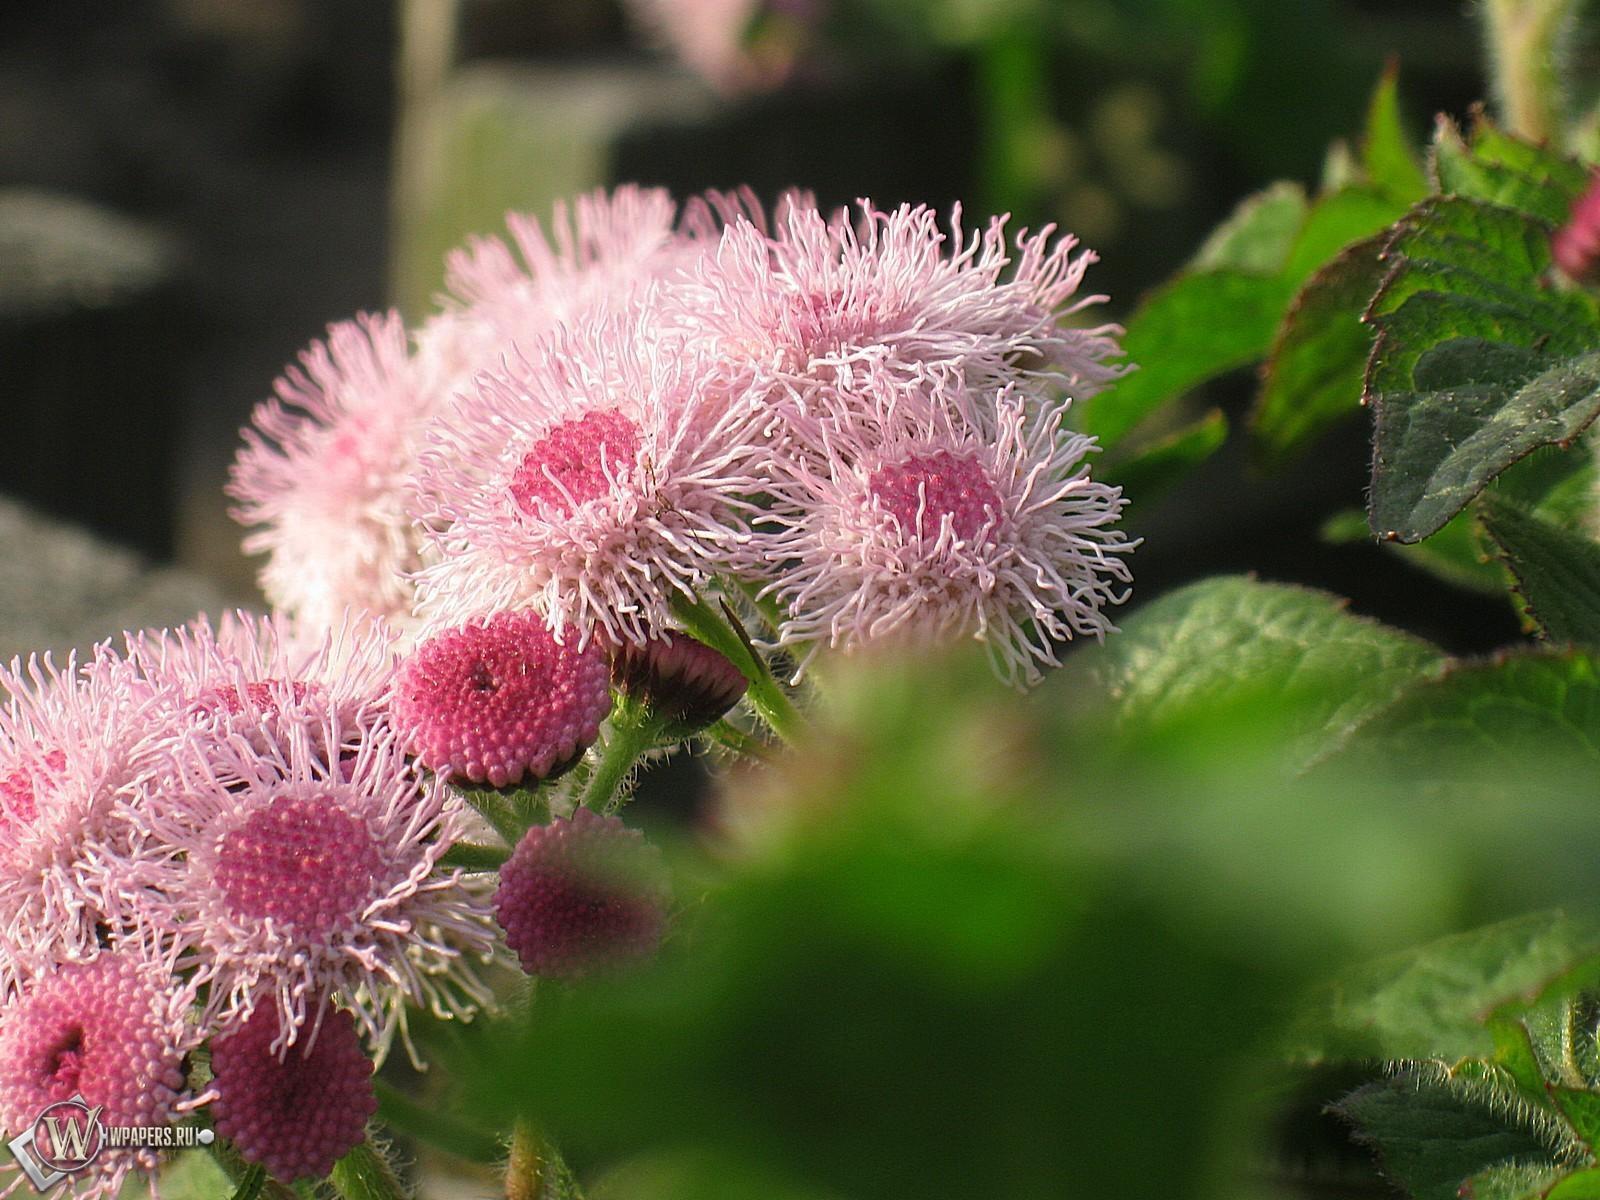 Садовые цветы 1600x1200